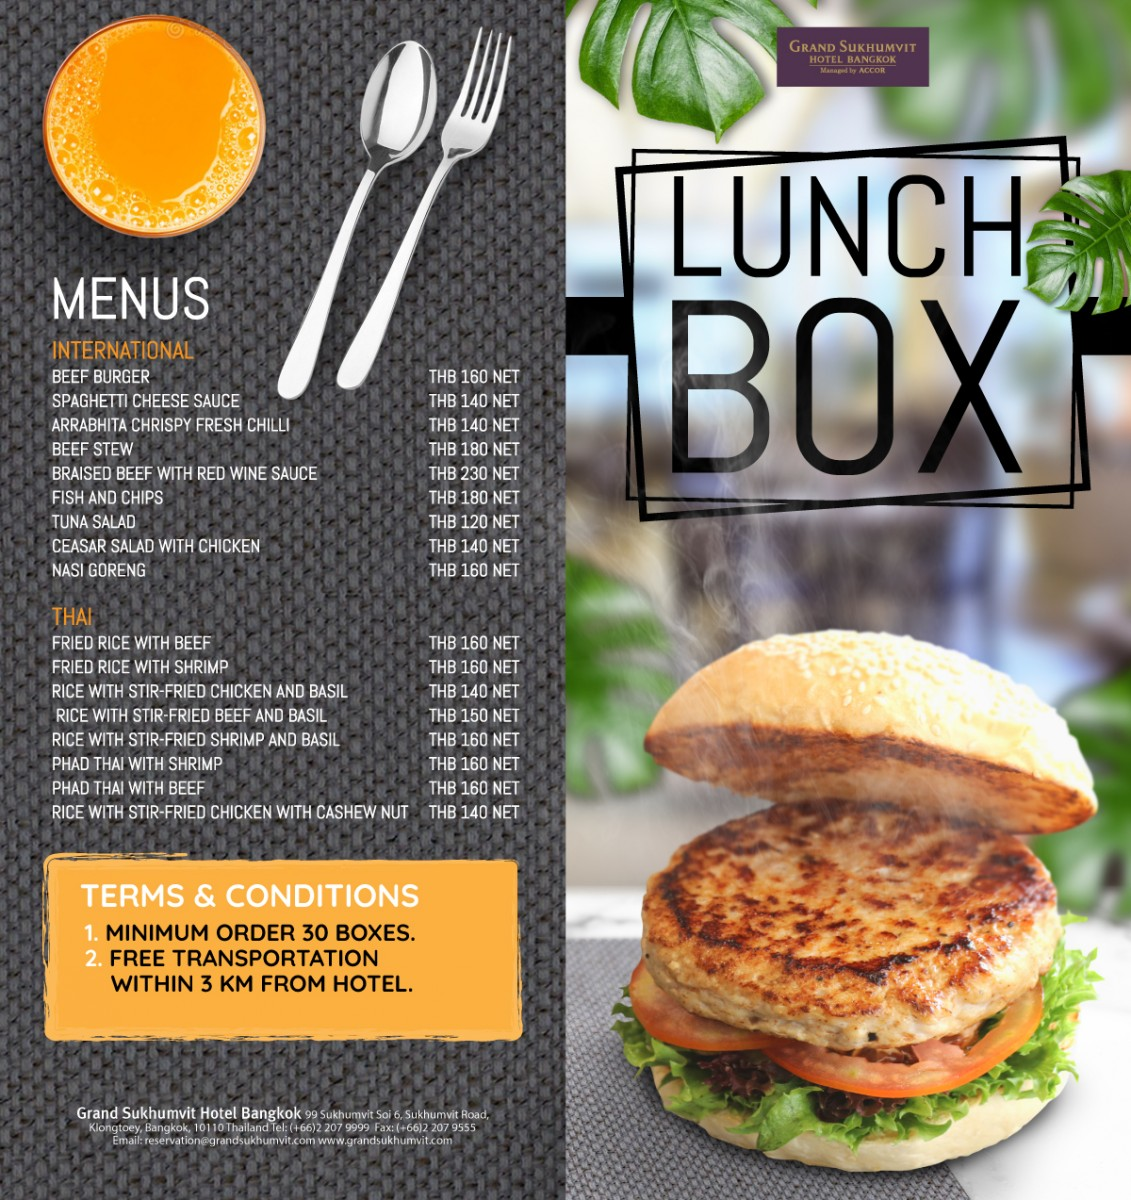 lunch-box-menu